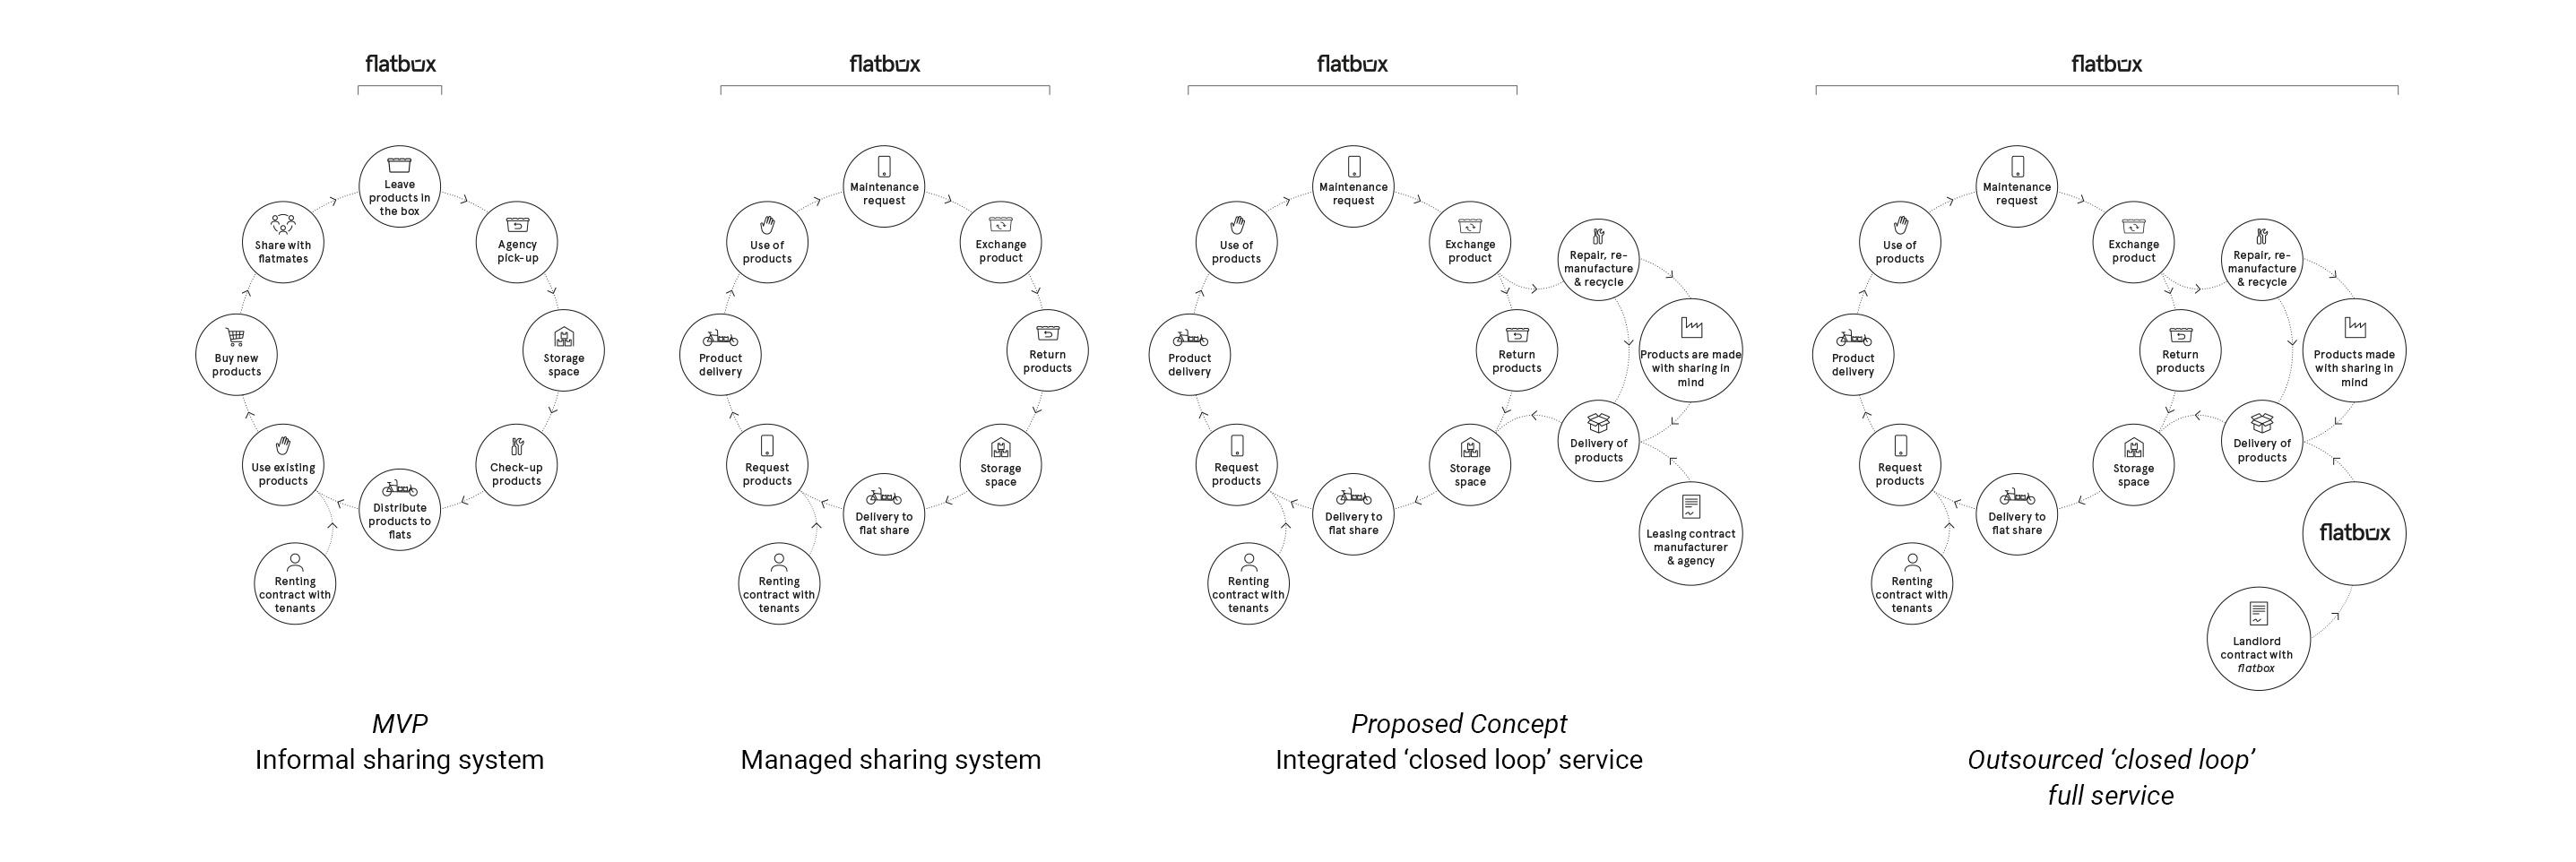 flatbox-discussion-scale